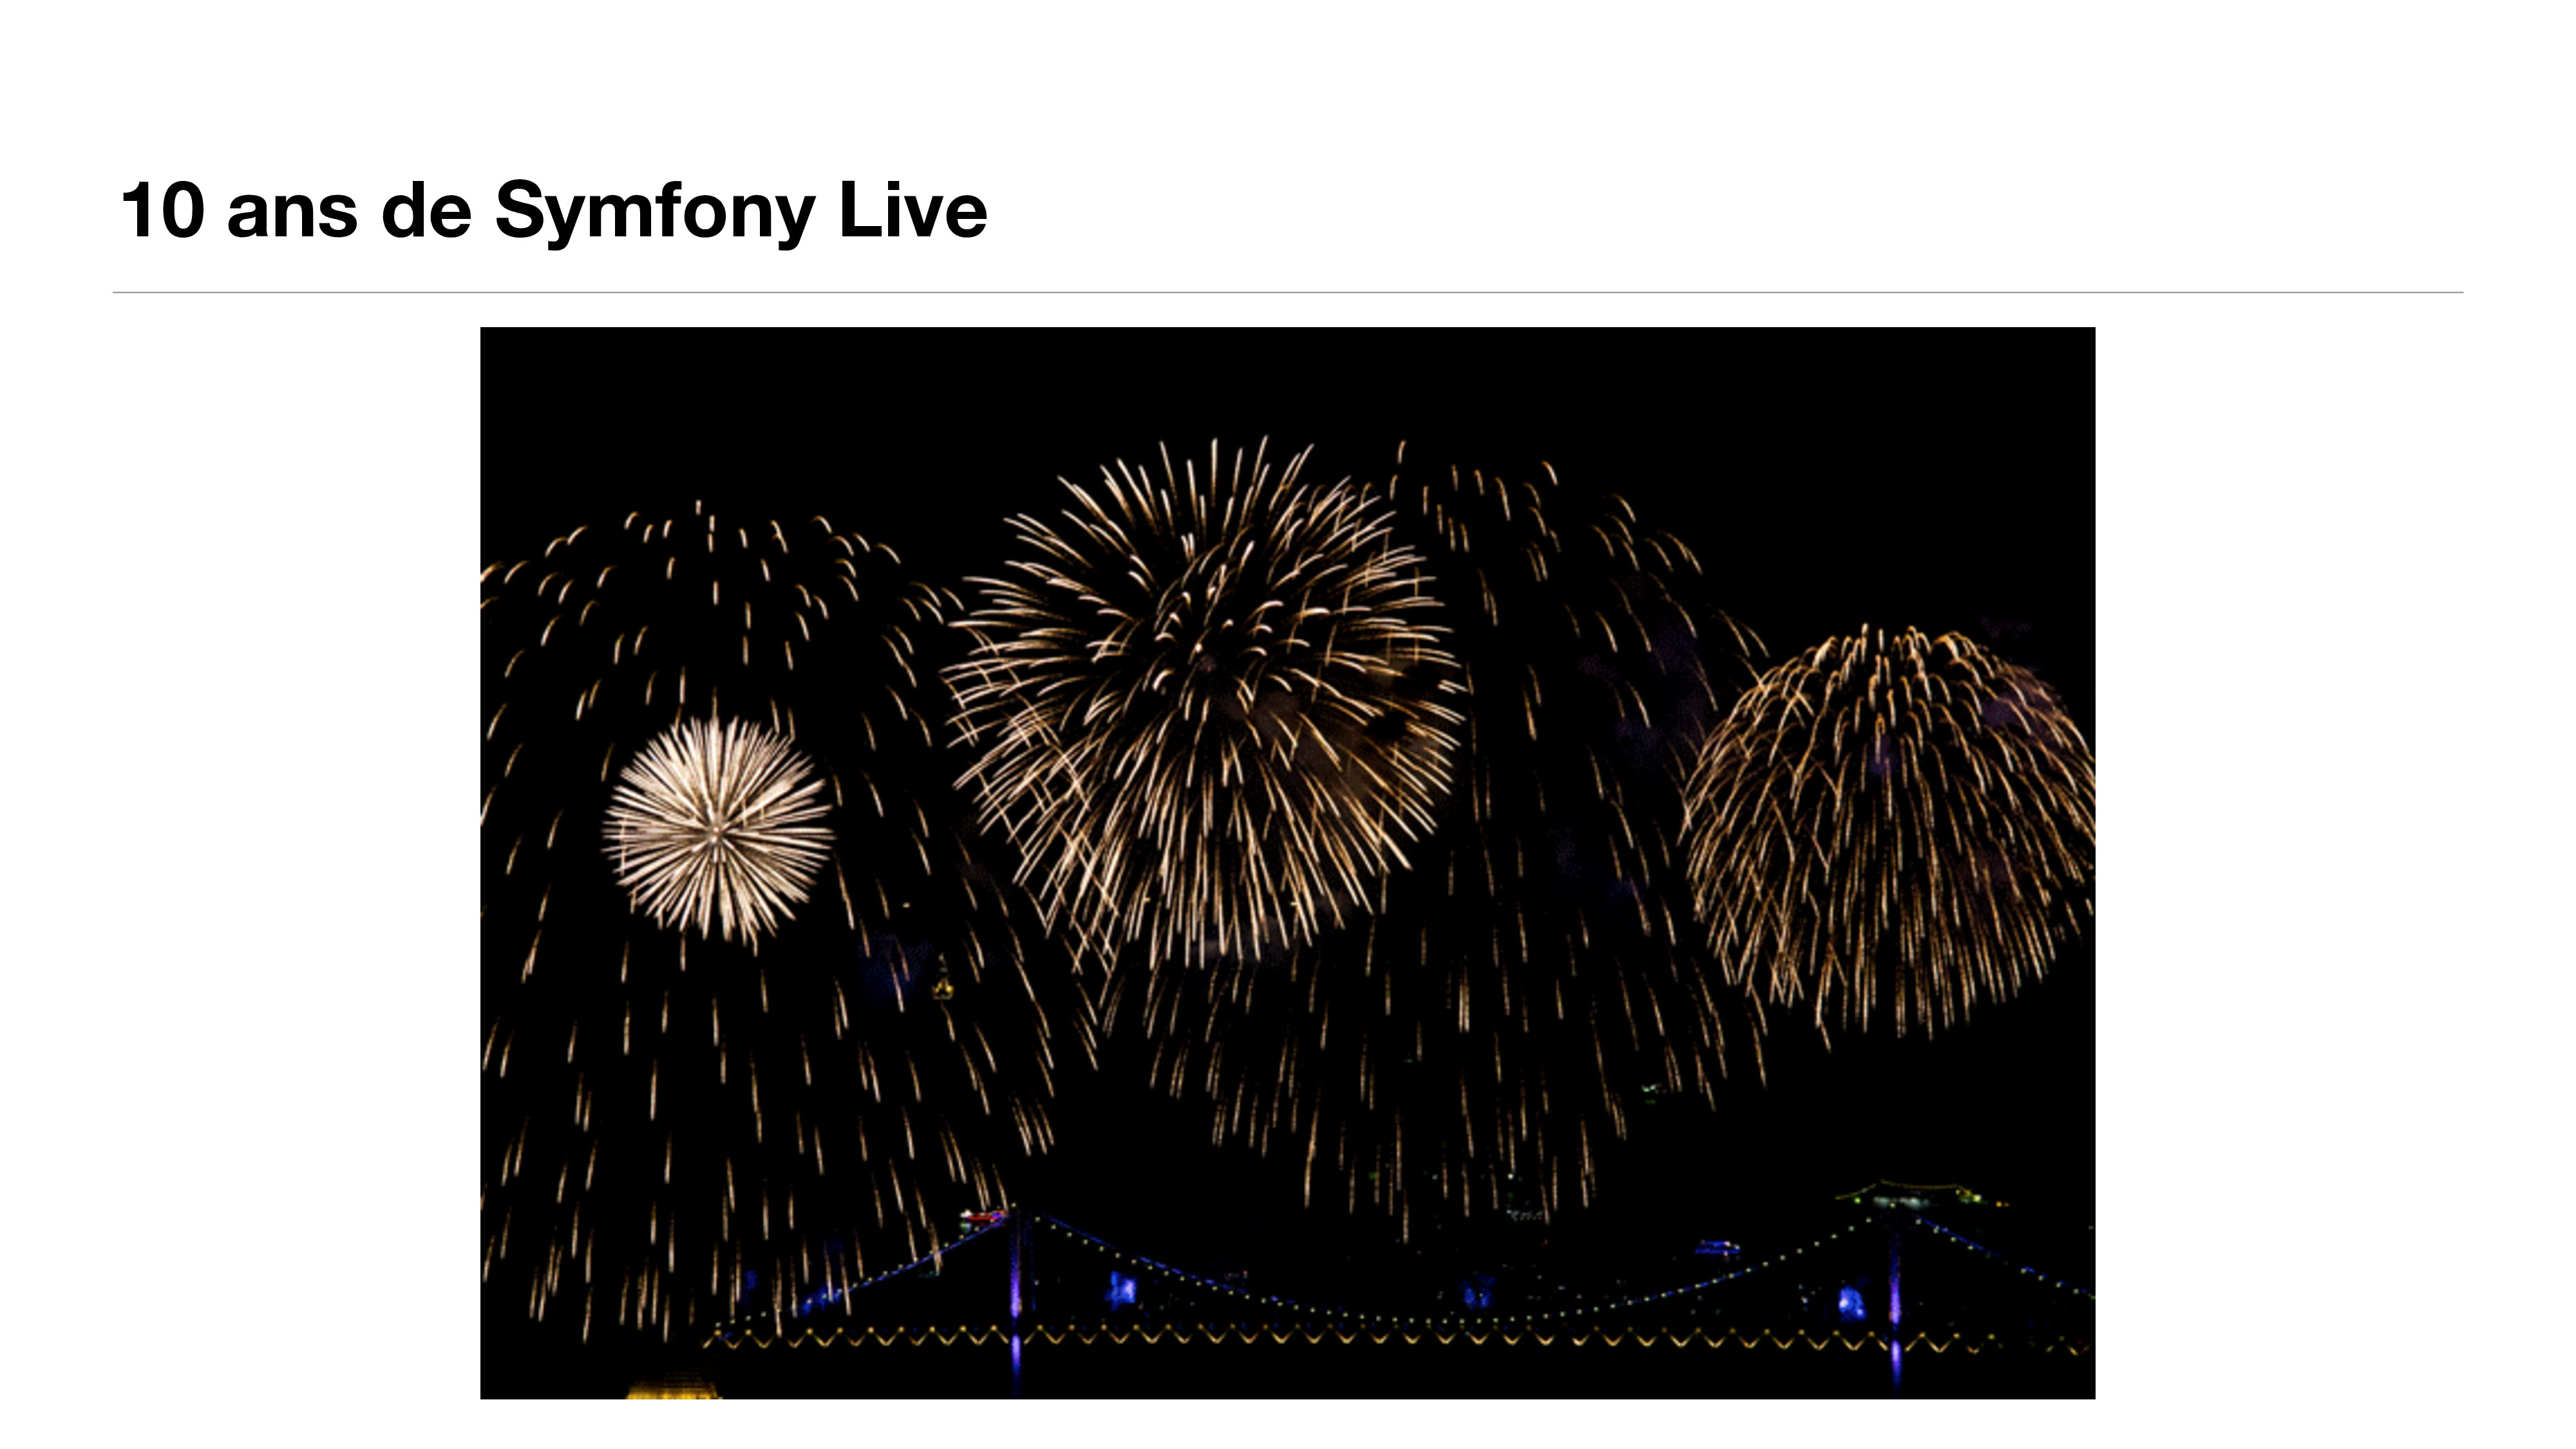 10 ans de Symfony Live